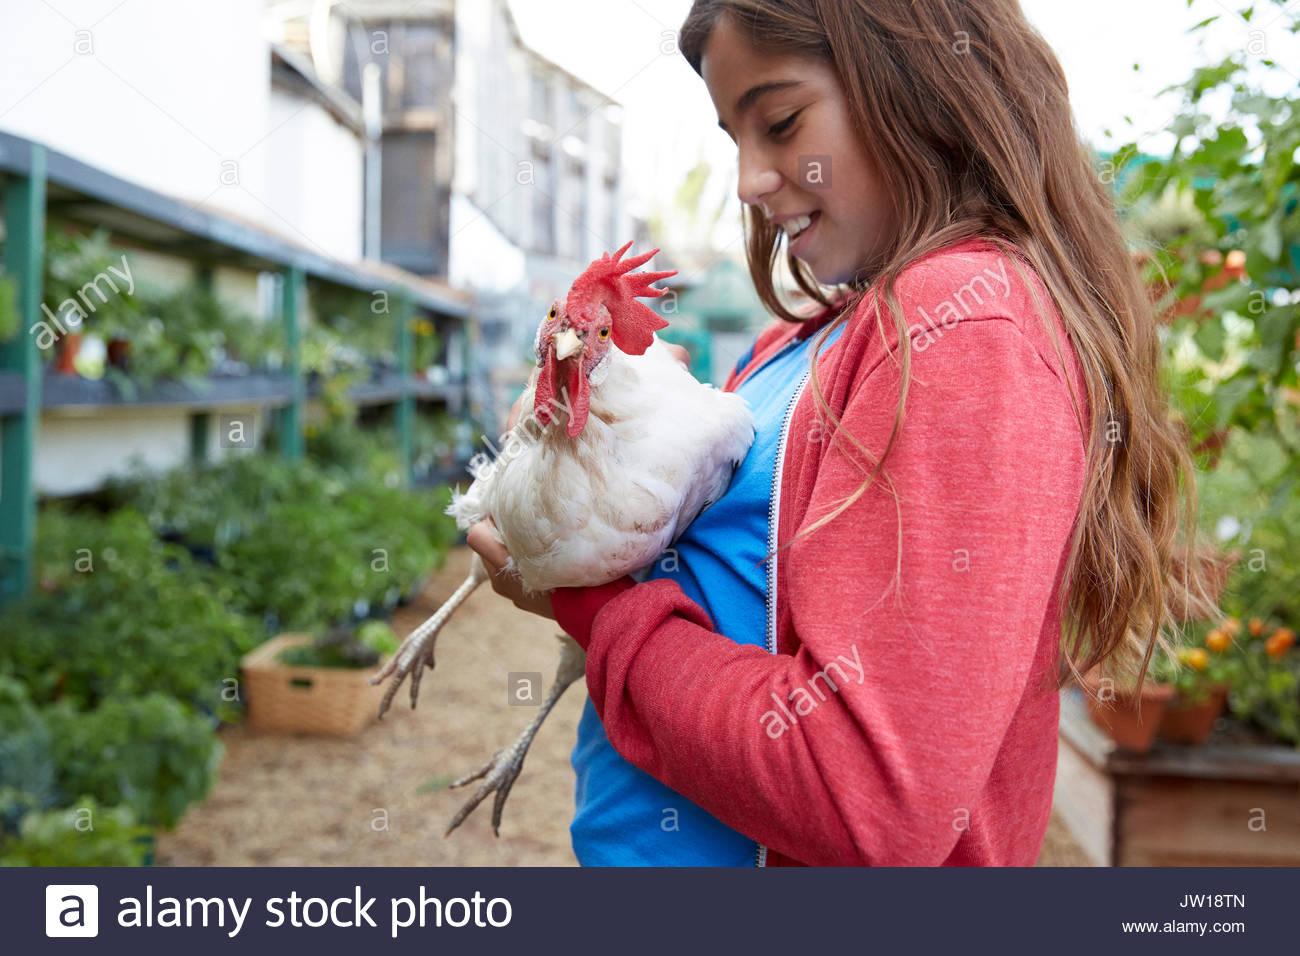 Latina girl holding chicken in garden - Stock Image